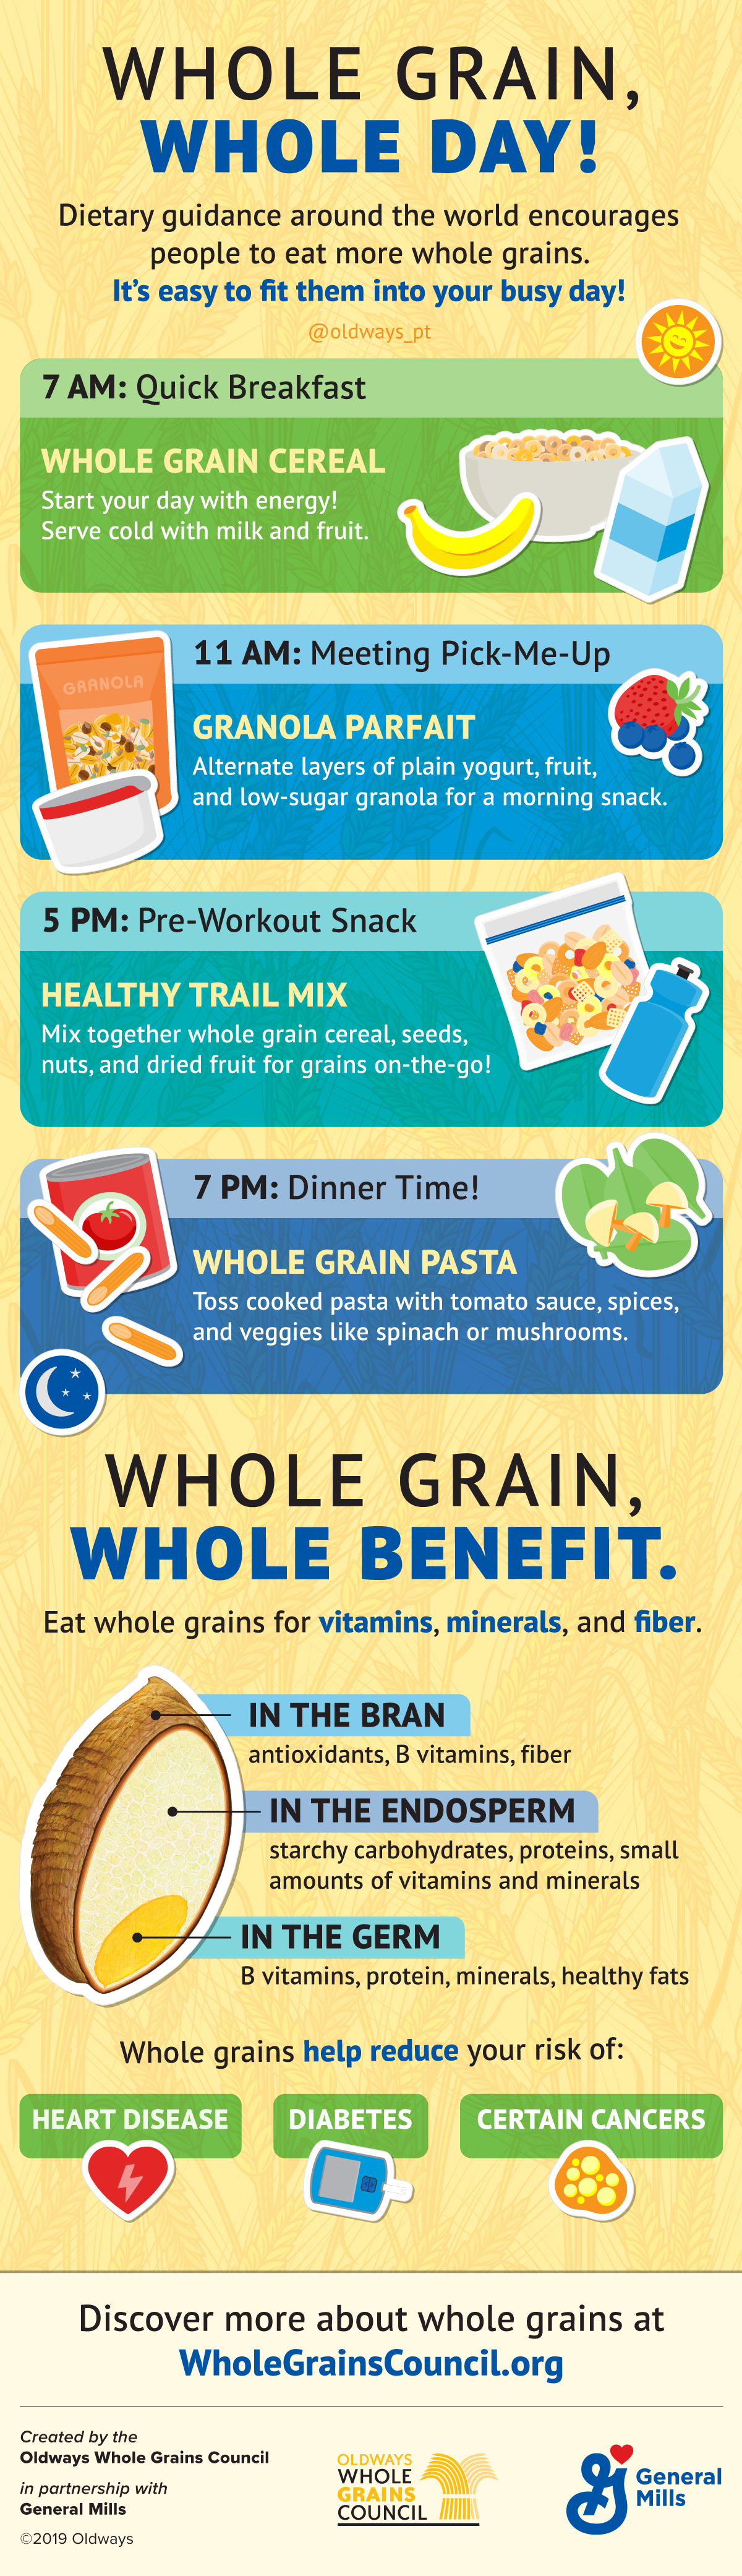 WholeGrainWholeDay-infographic.png